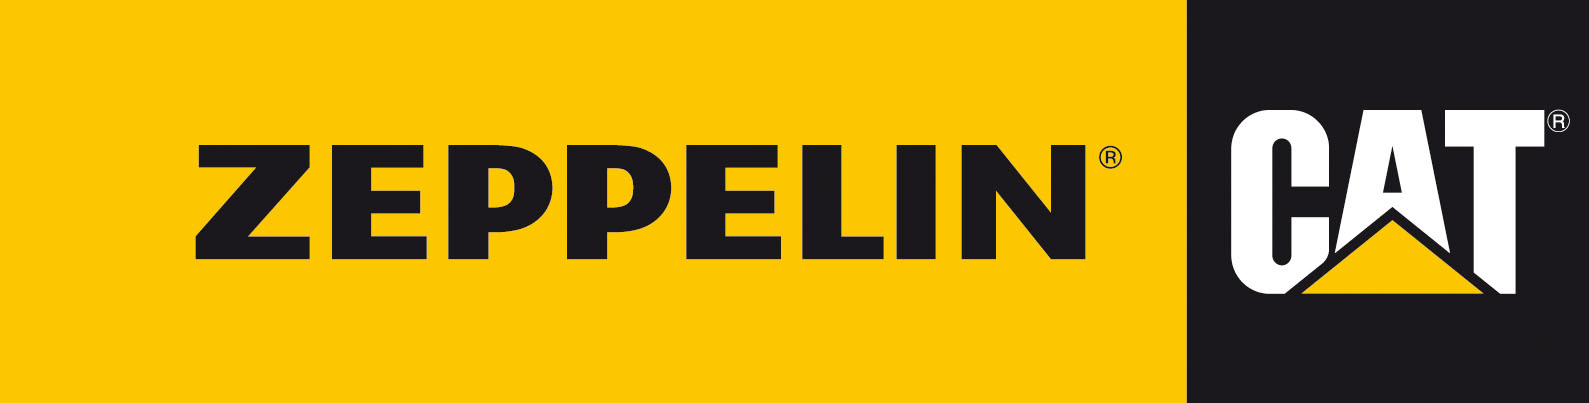 Zeppelin Logo Wallpaper